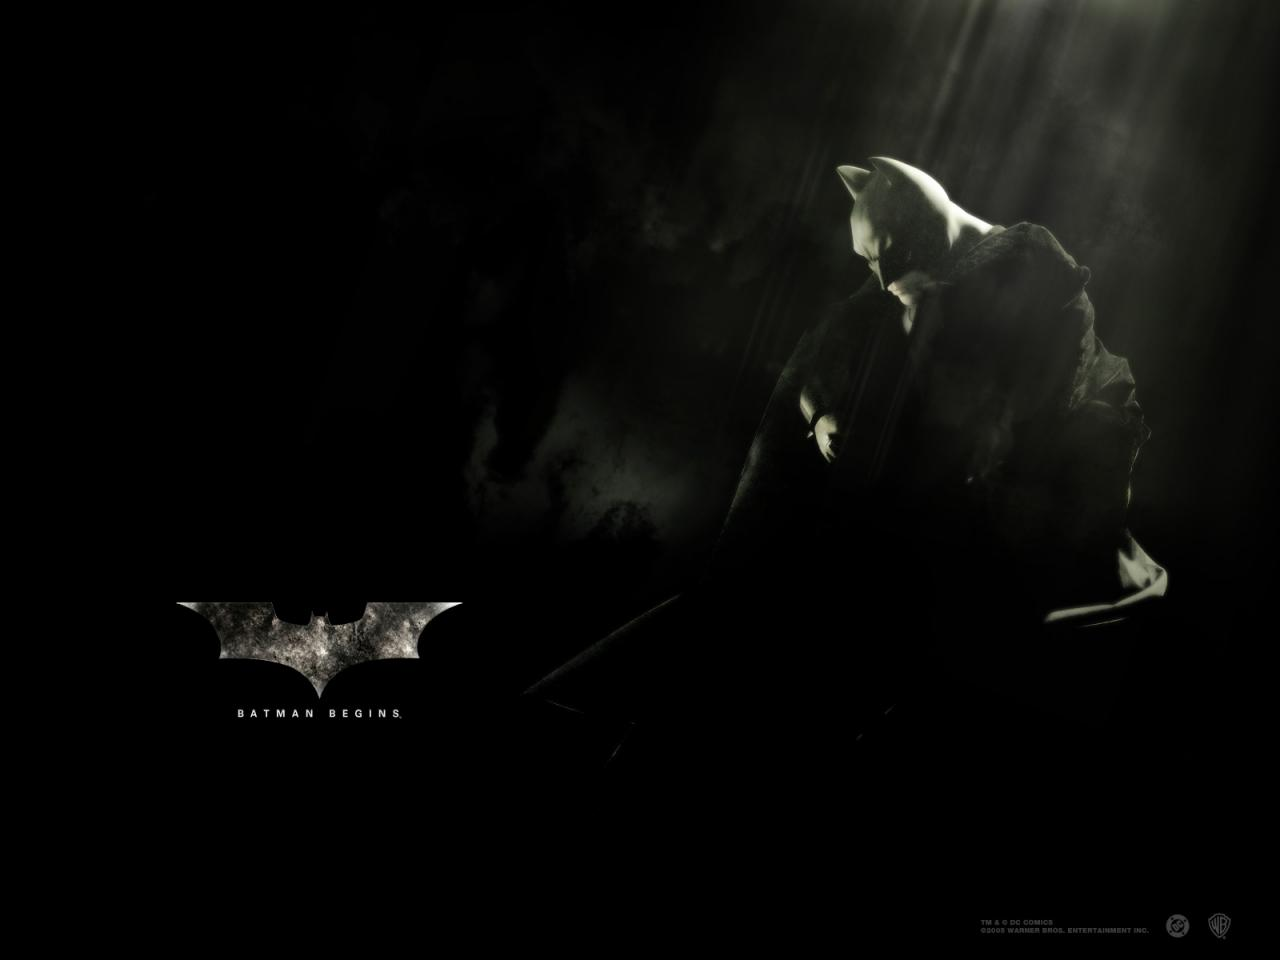 Wallpaper Batman begins Bruce Wayne